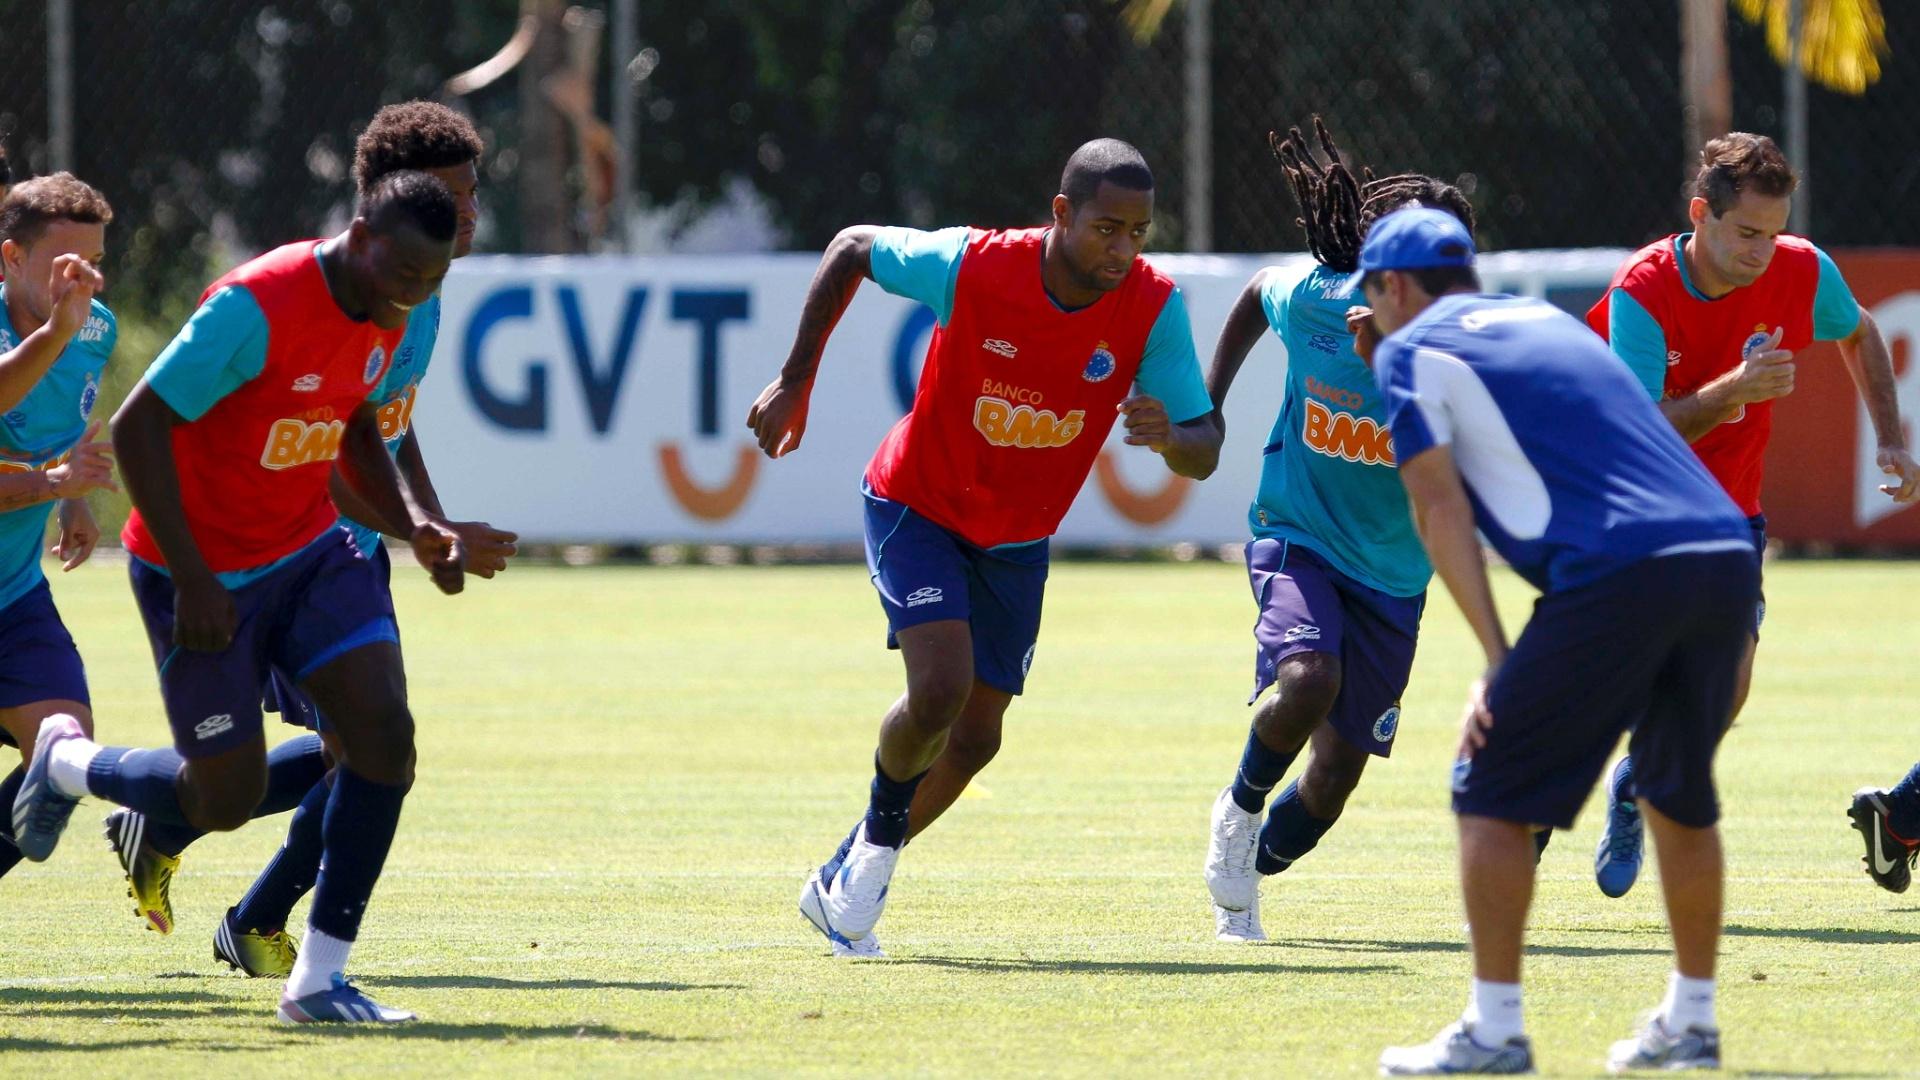 Zagueiro Dedé durante treino do Cruzeiro na Toca da Raposa II (30/4/2013)